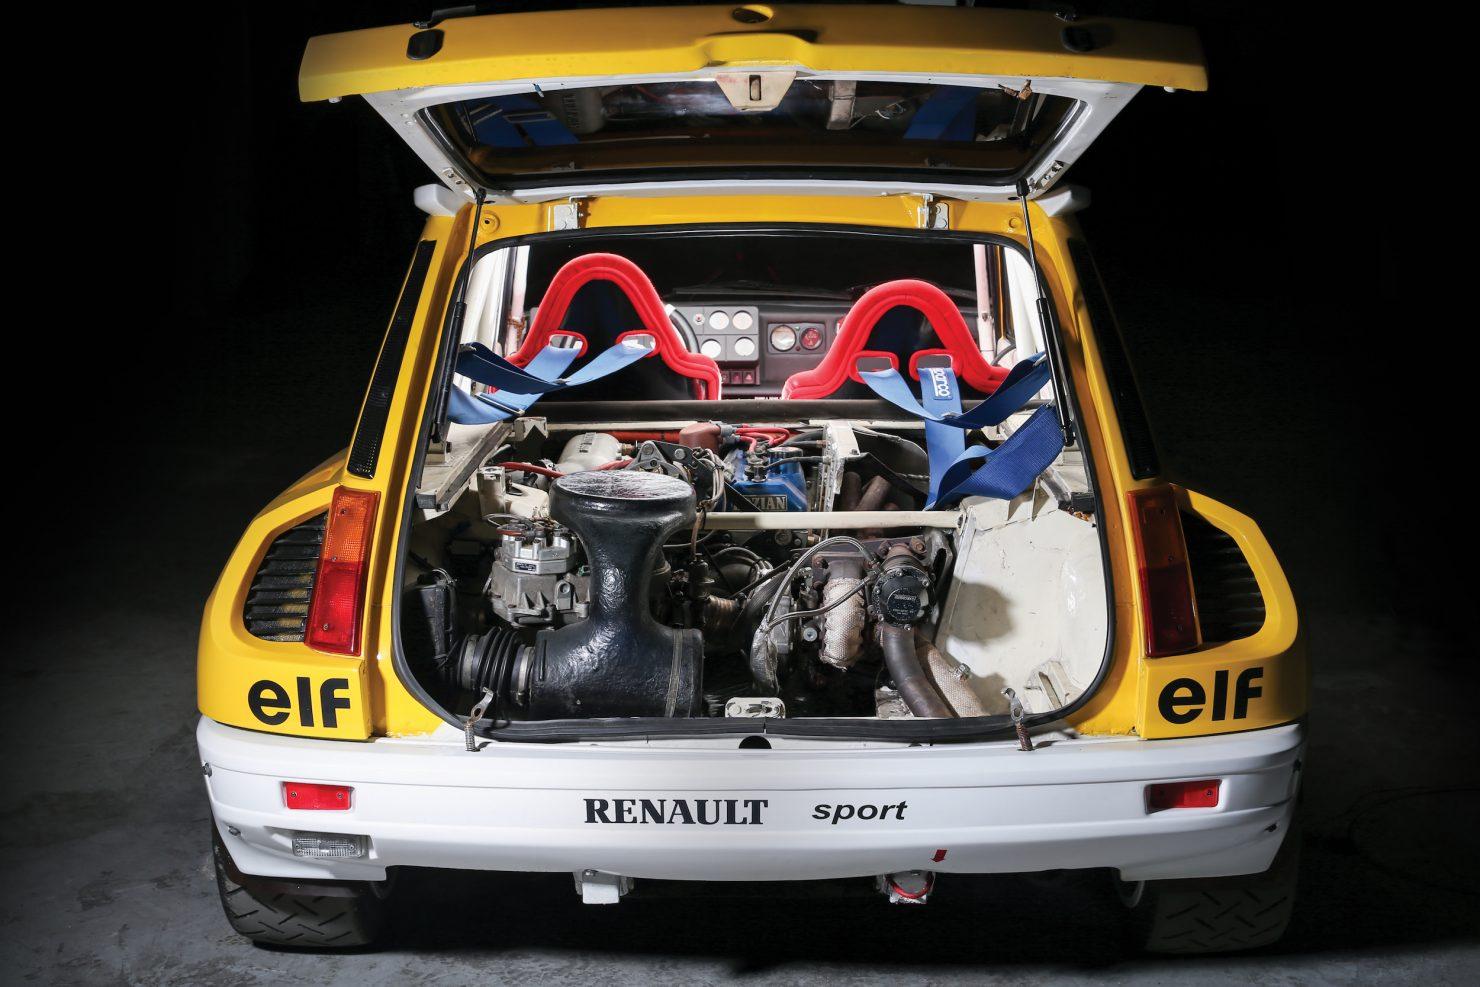 Renault 5 Turbo 12 1480x987 - 1980 Renault 5 Turbo